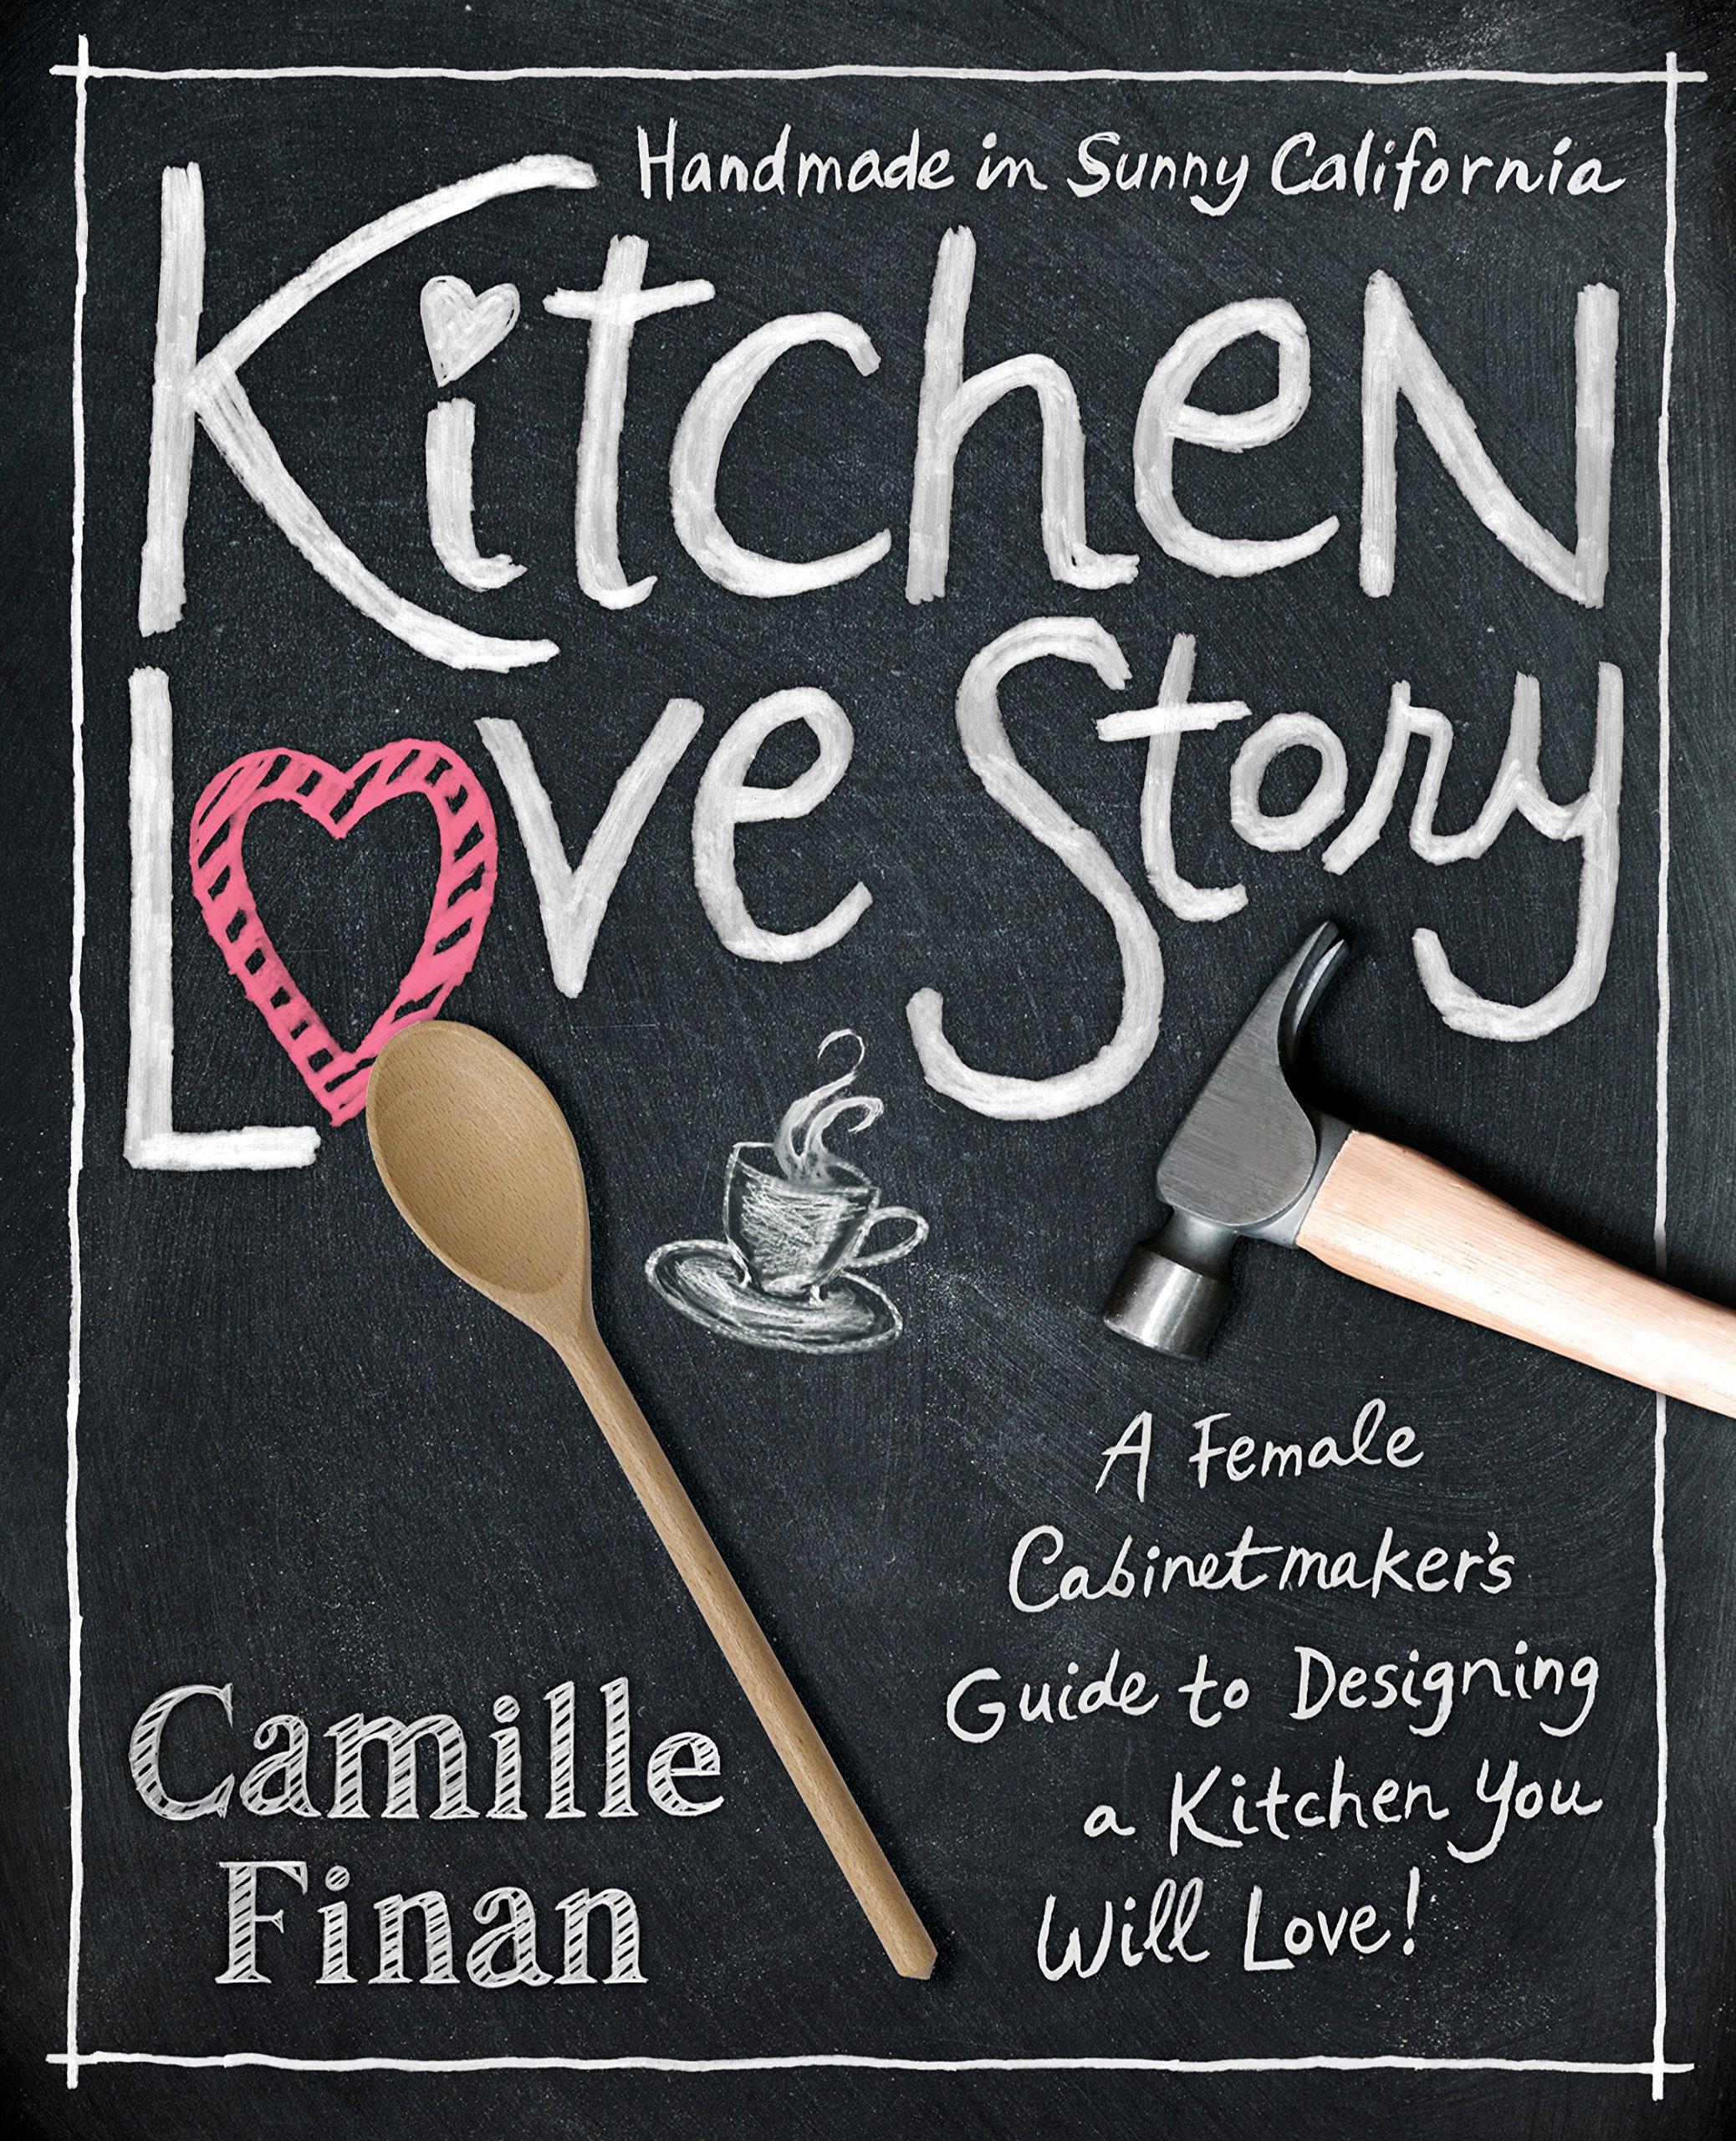 Kitchen Love Story